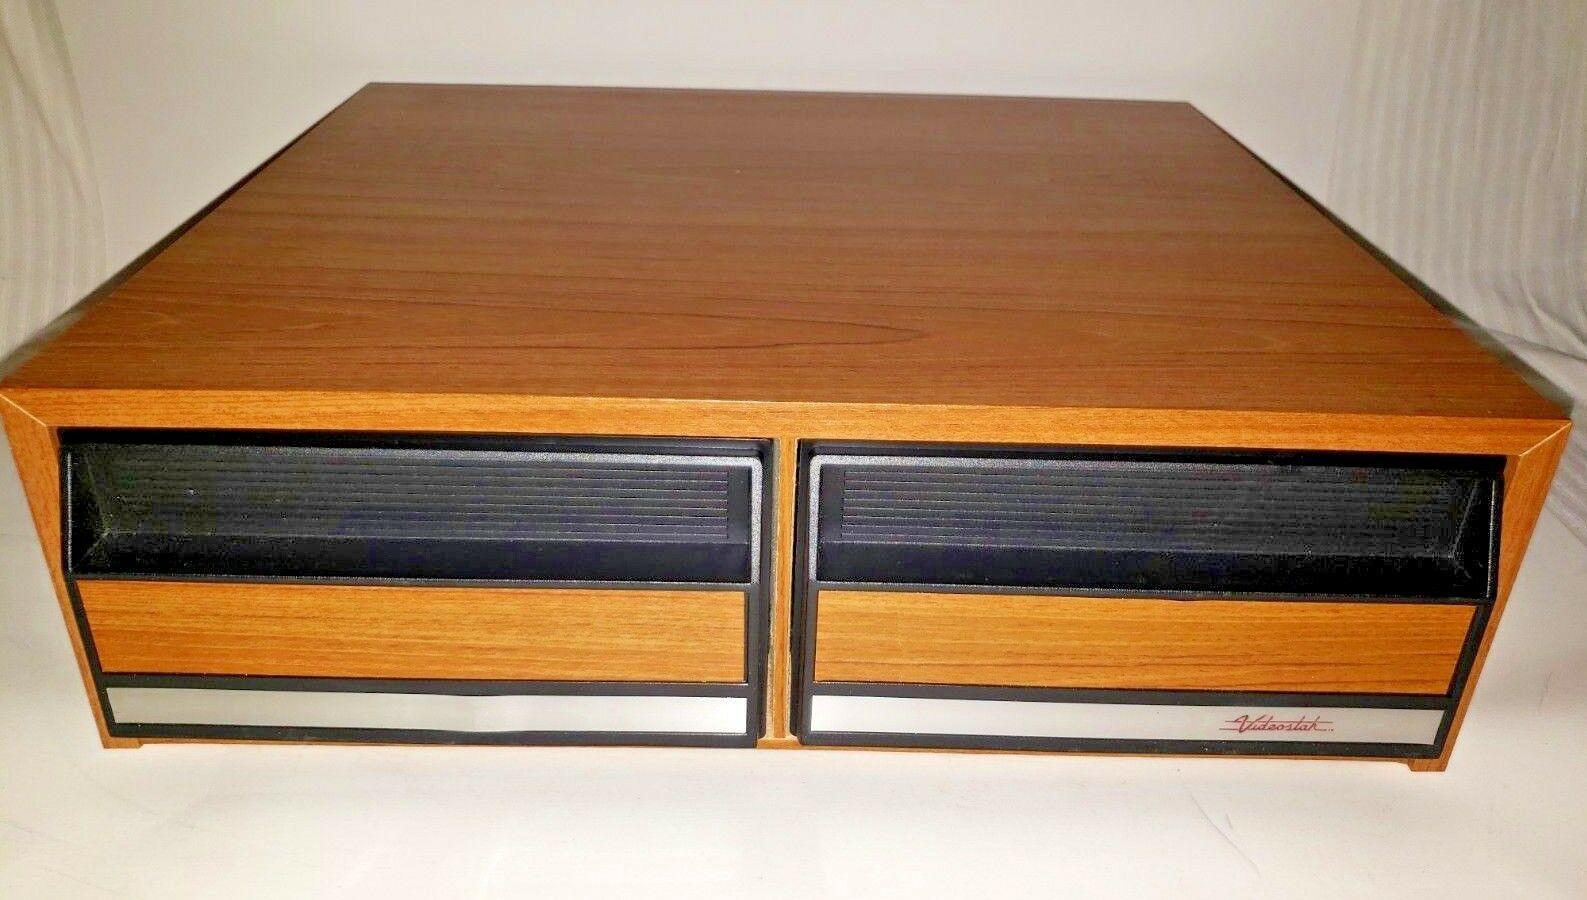 Vintage Videostak Video Cassette Cabinet Holds 24 VHS Tapes..In Original Box image 3